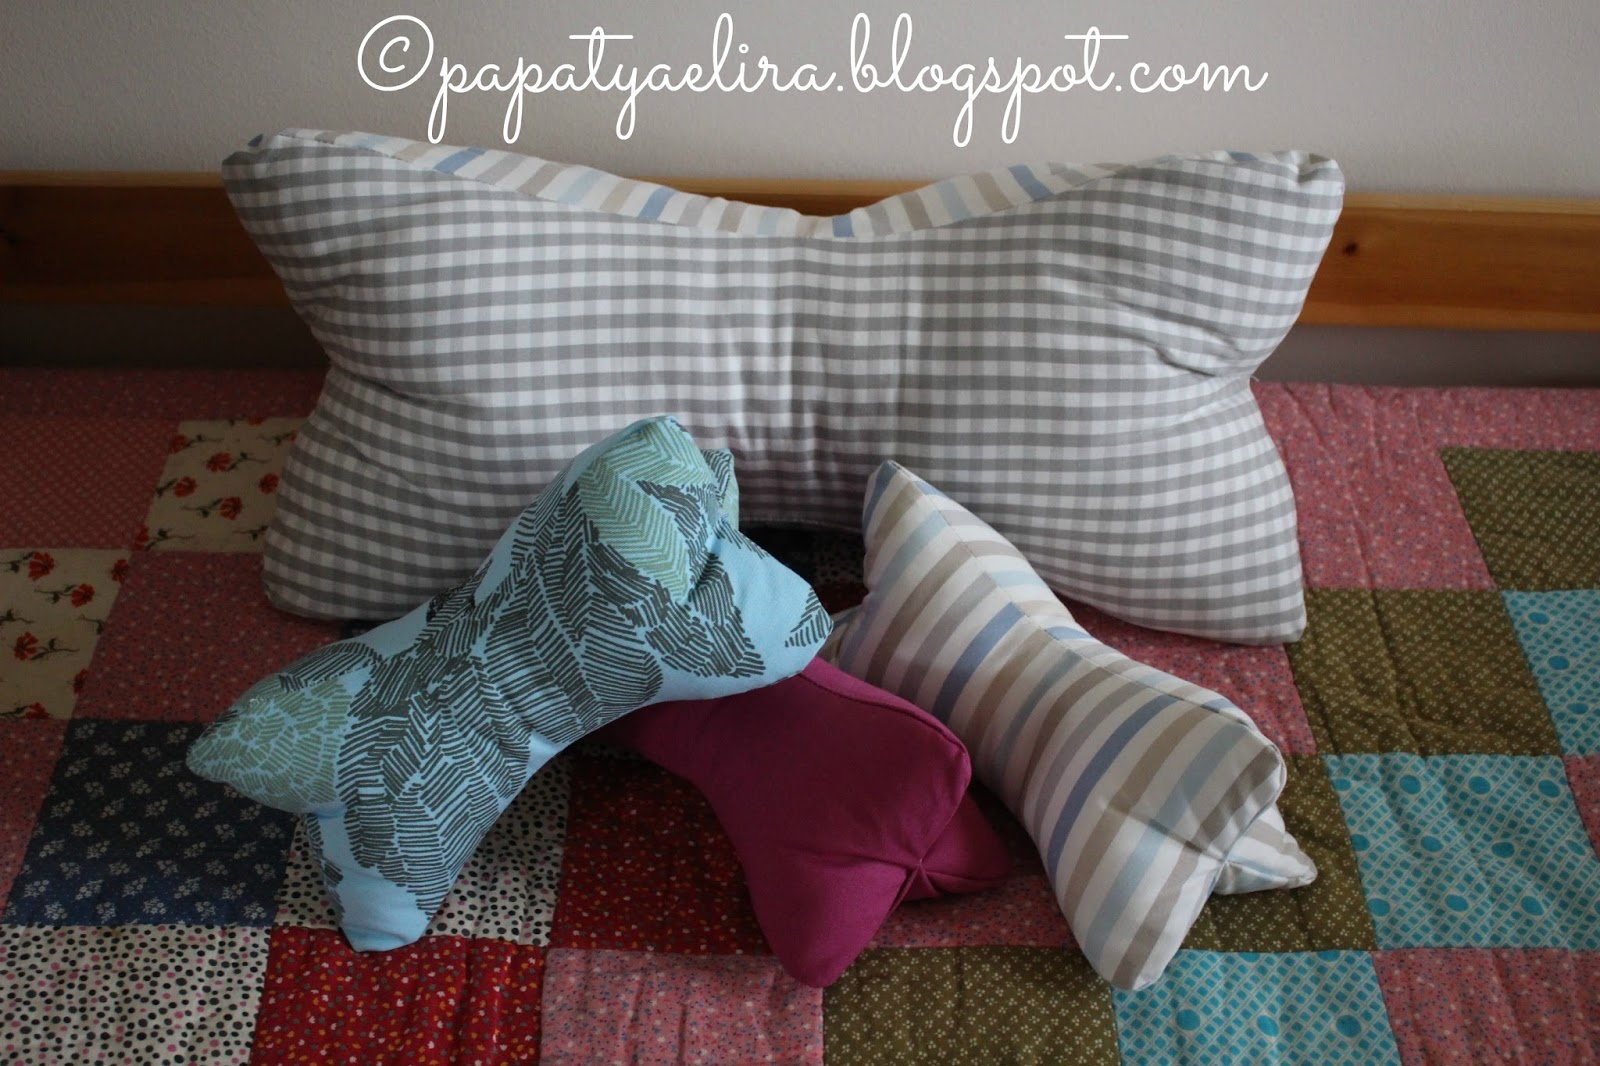 papatya elira knochenkissen nackenkissen hauptsache kissen. Black Bedroom Furniture Sets. Home Design Ideas